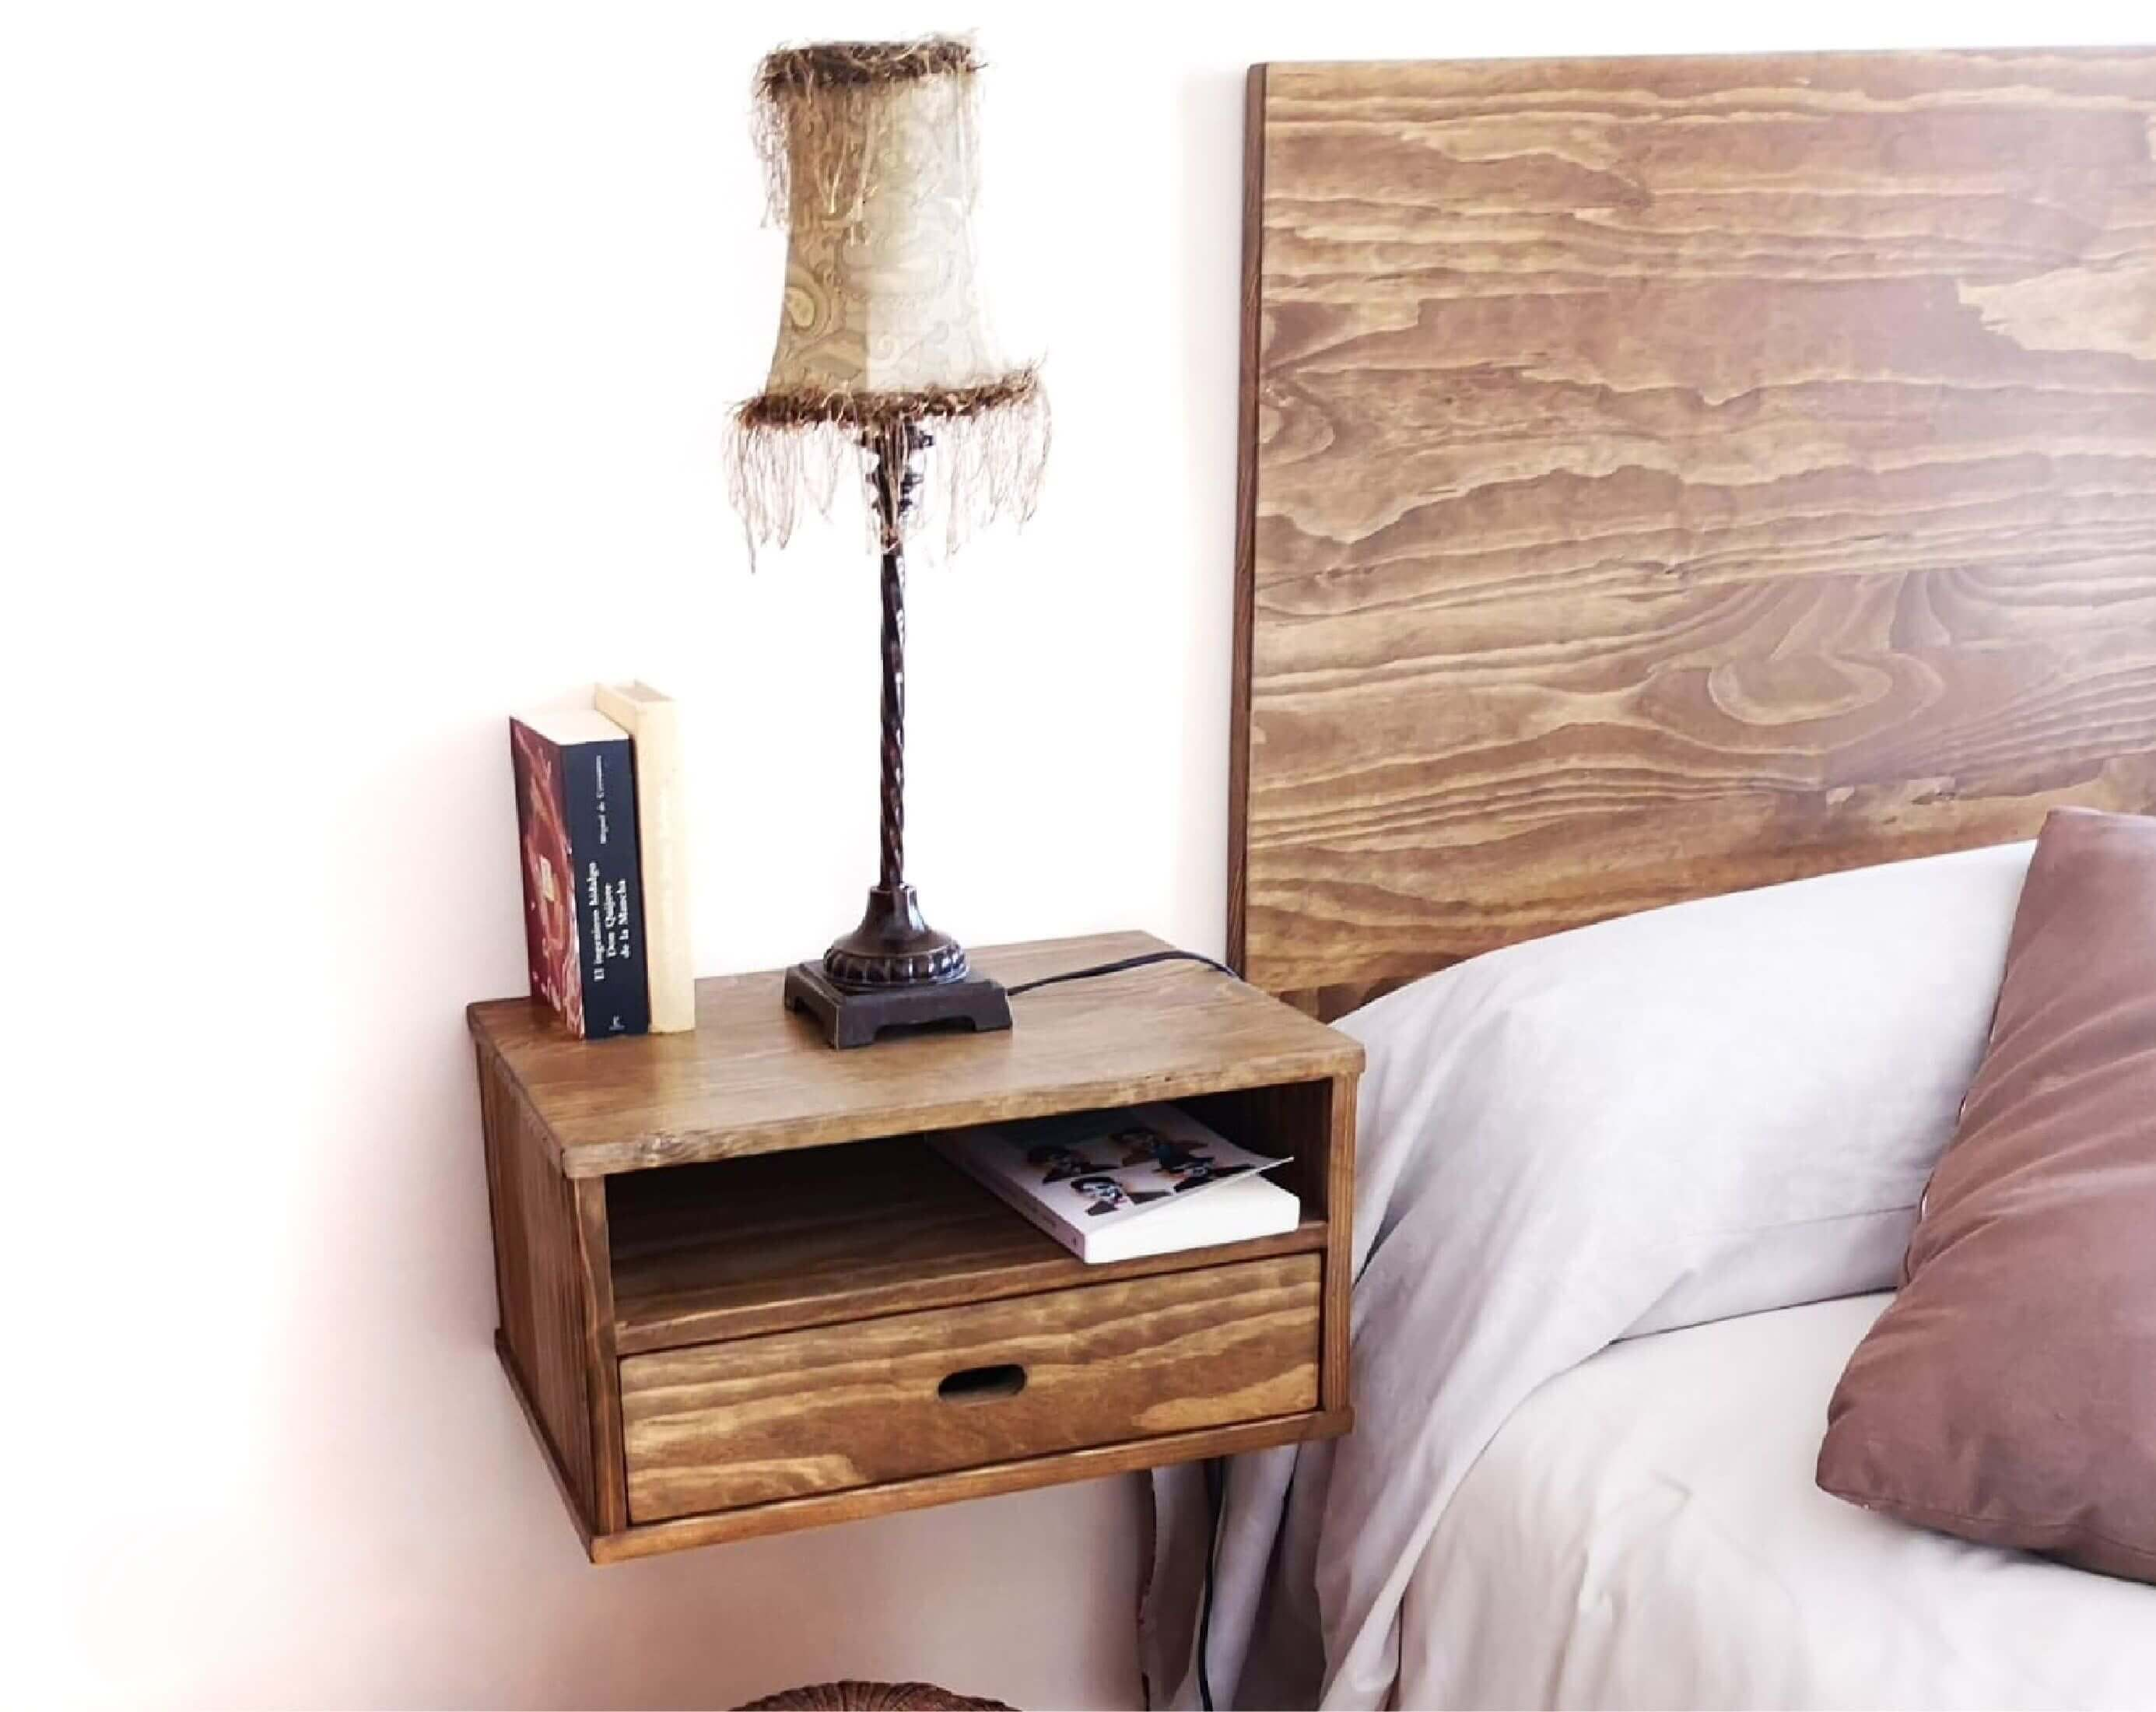 Solid wood floating shelf unit